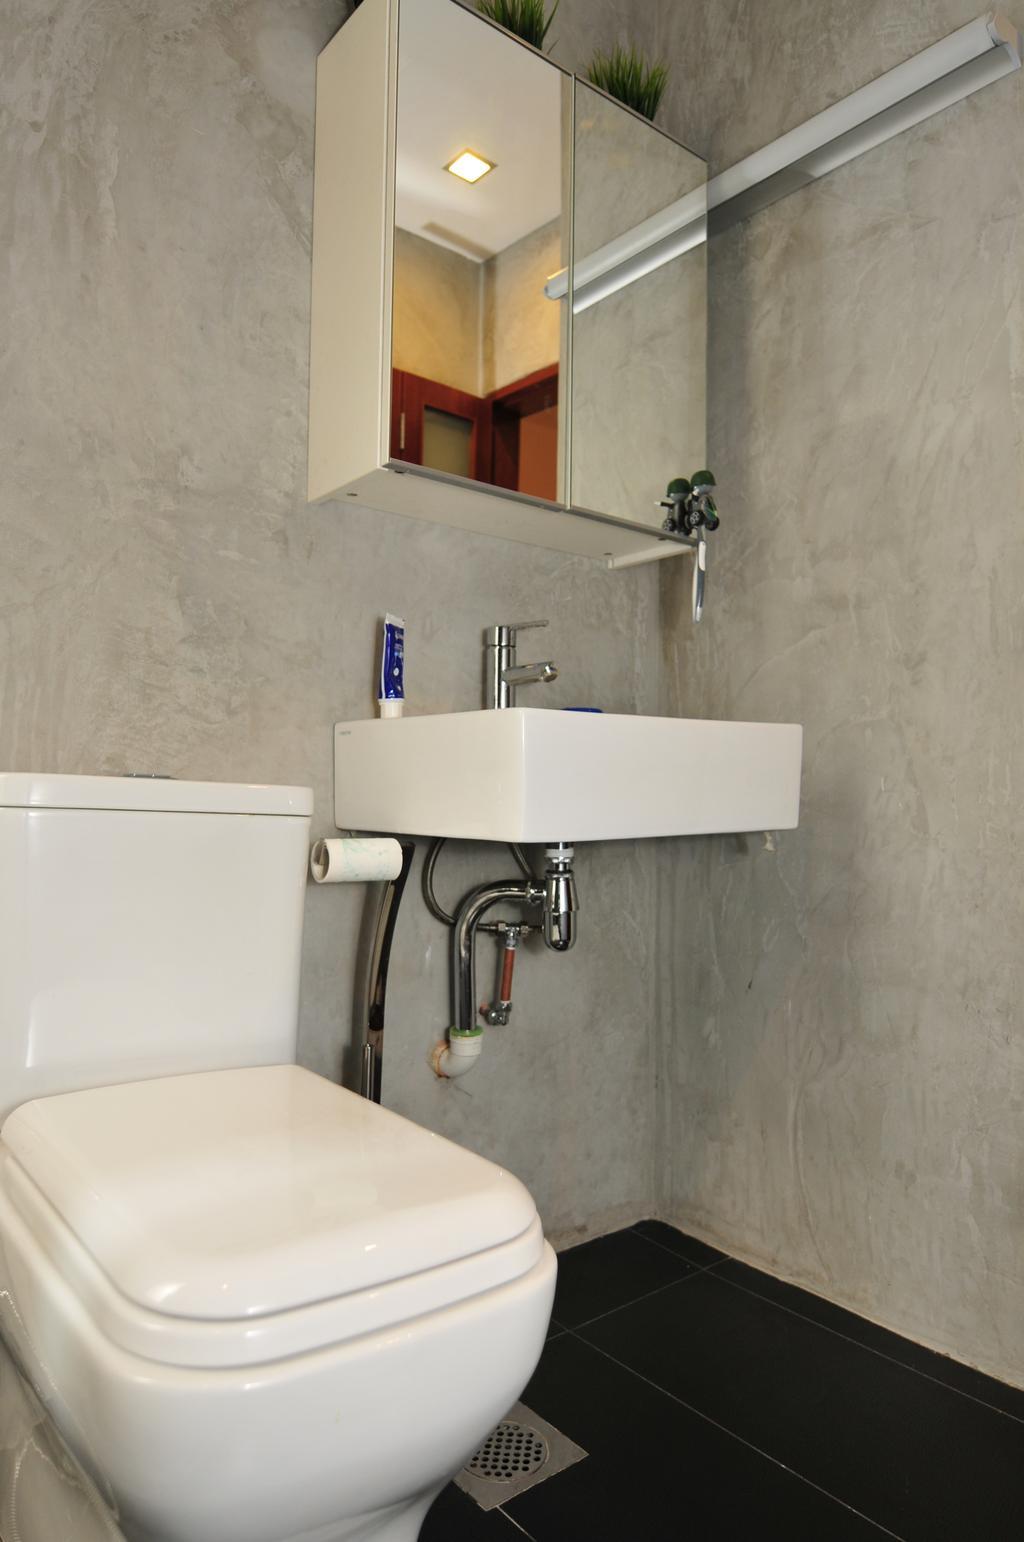 Transitional, Condo, Bathroom, Eastern Lagoon, Interior Designer, Seven Heaven, Plumbing